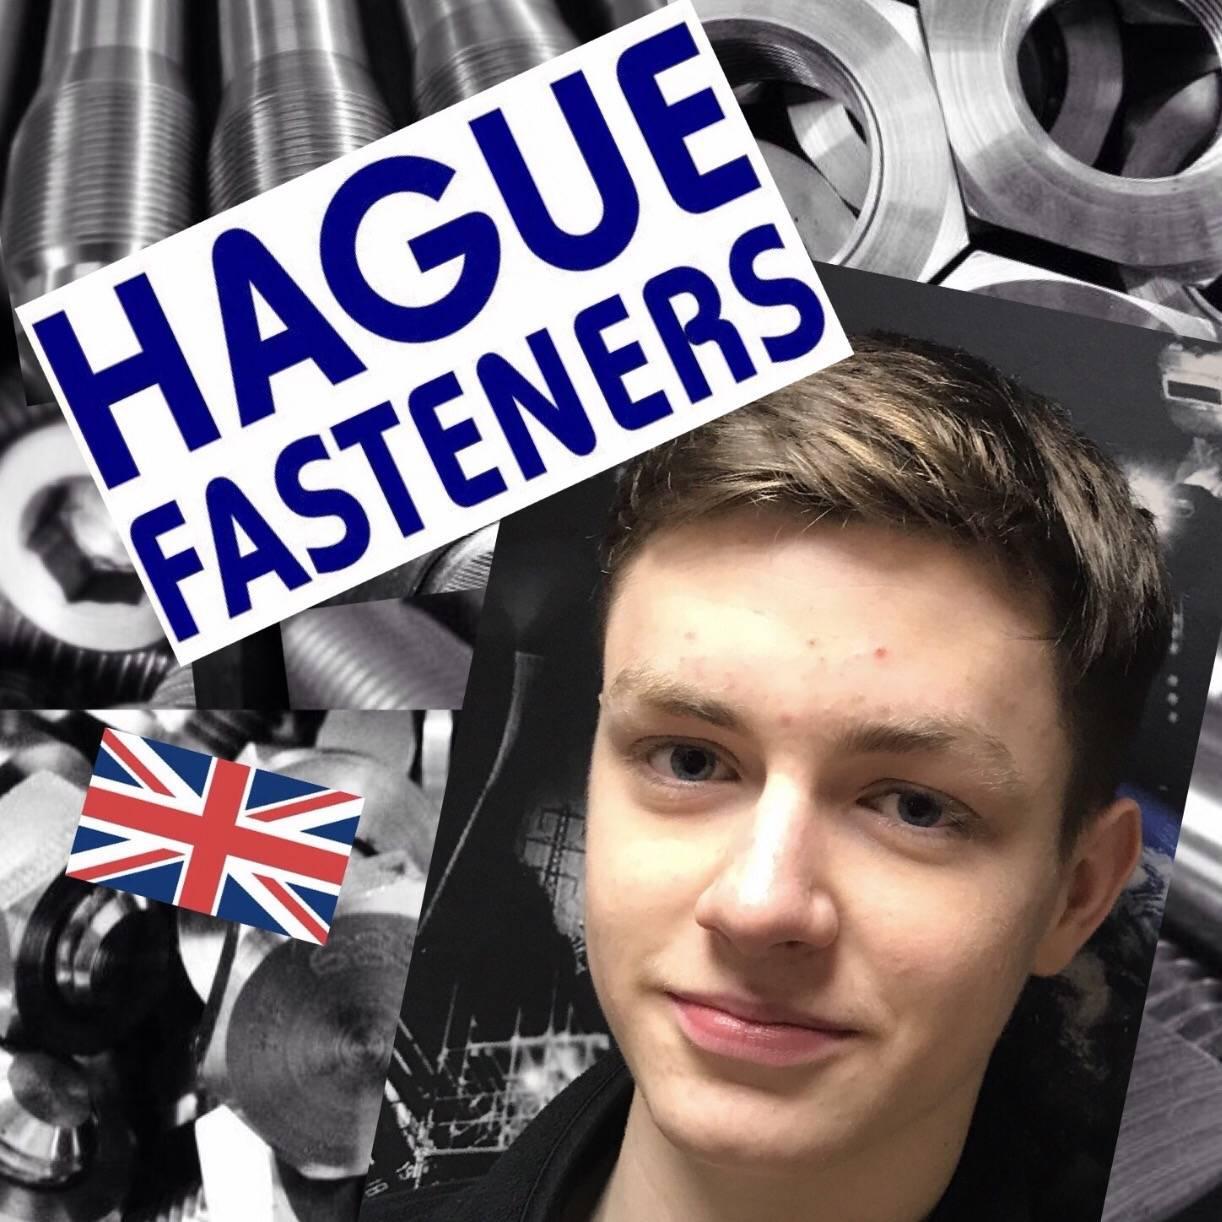 Tom Hague